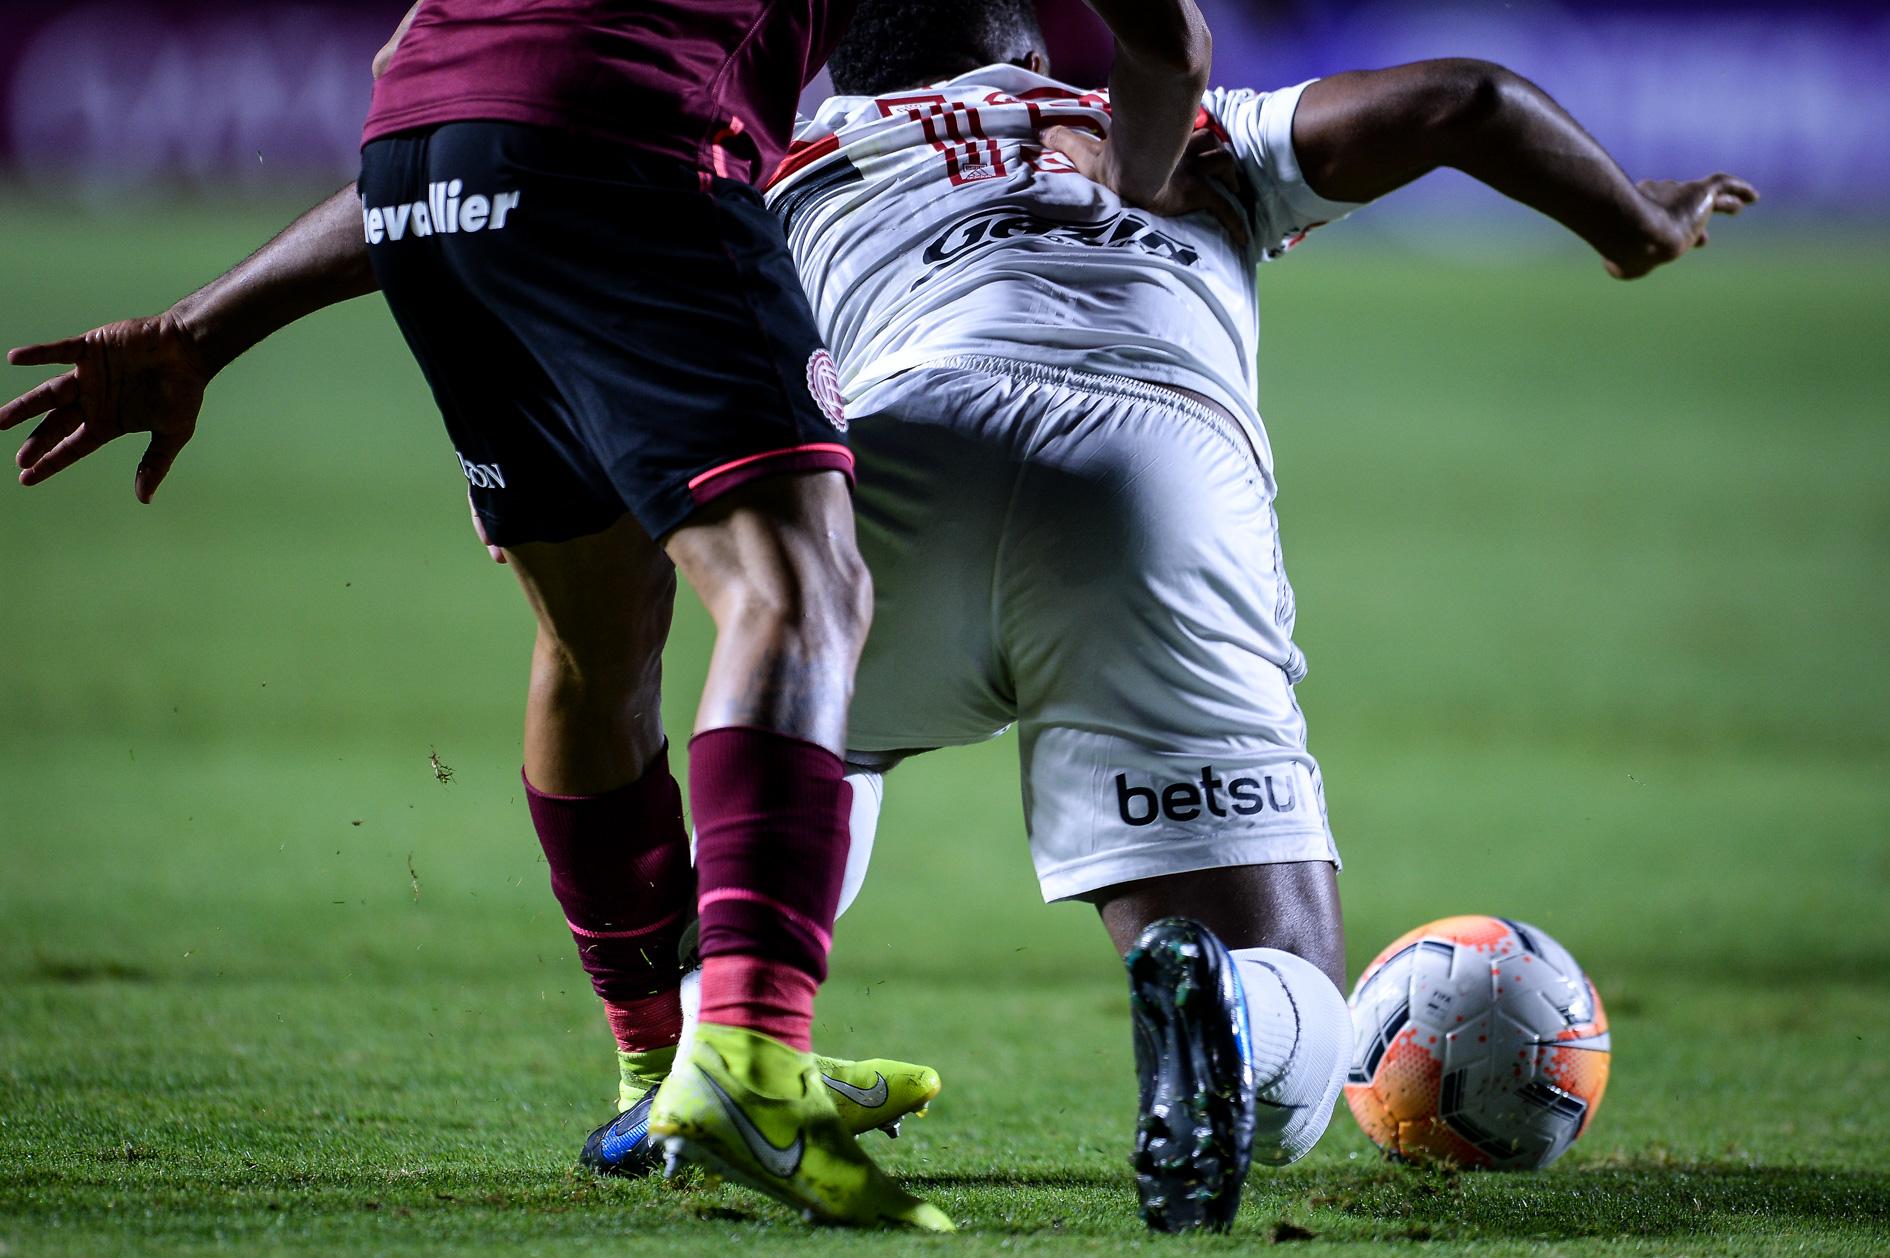 04-11-2020 - Copa CONMEBOL Sudamericana